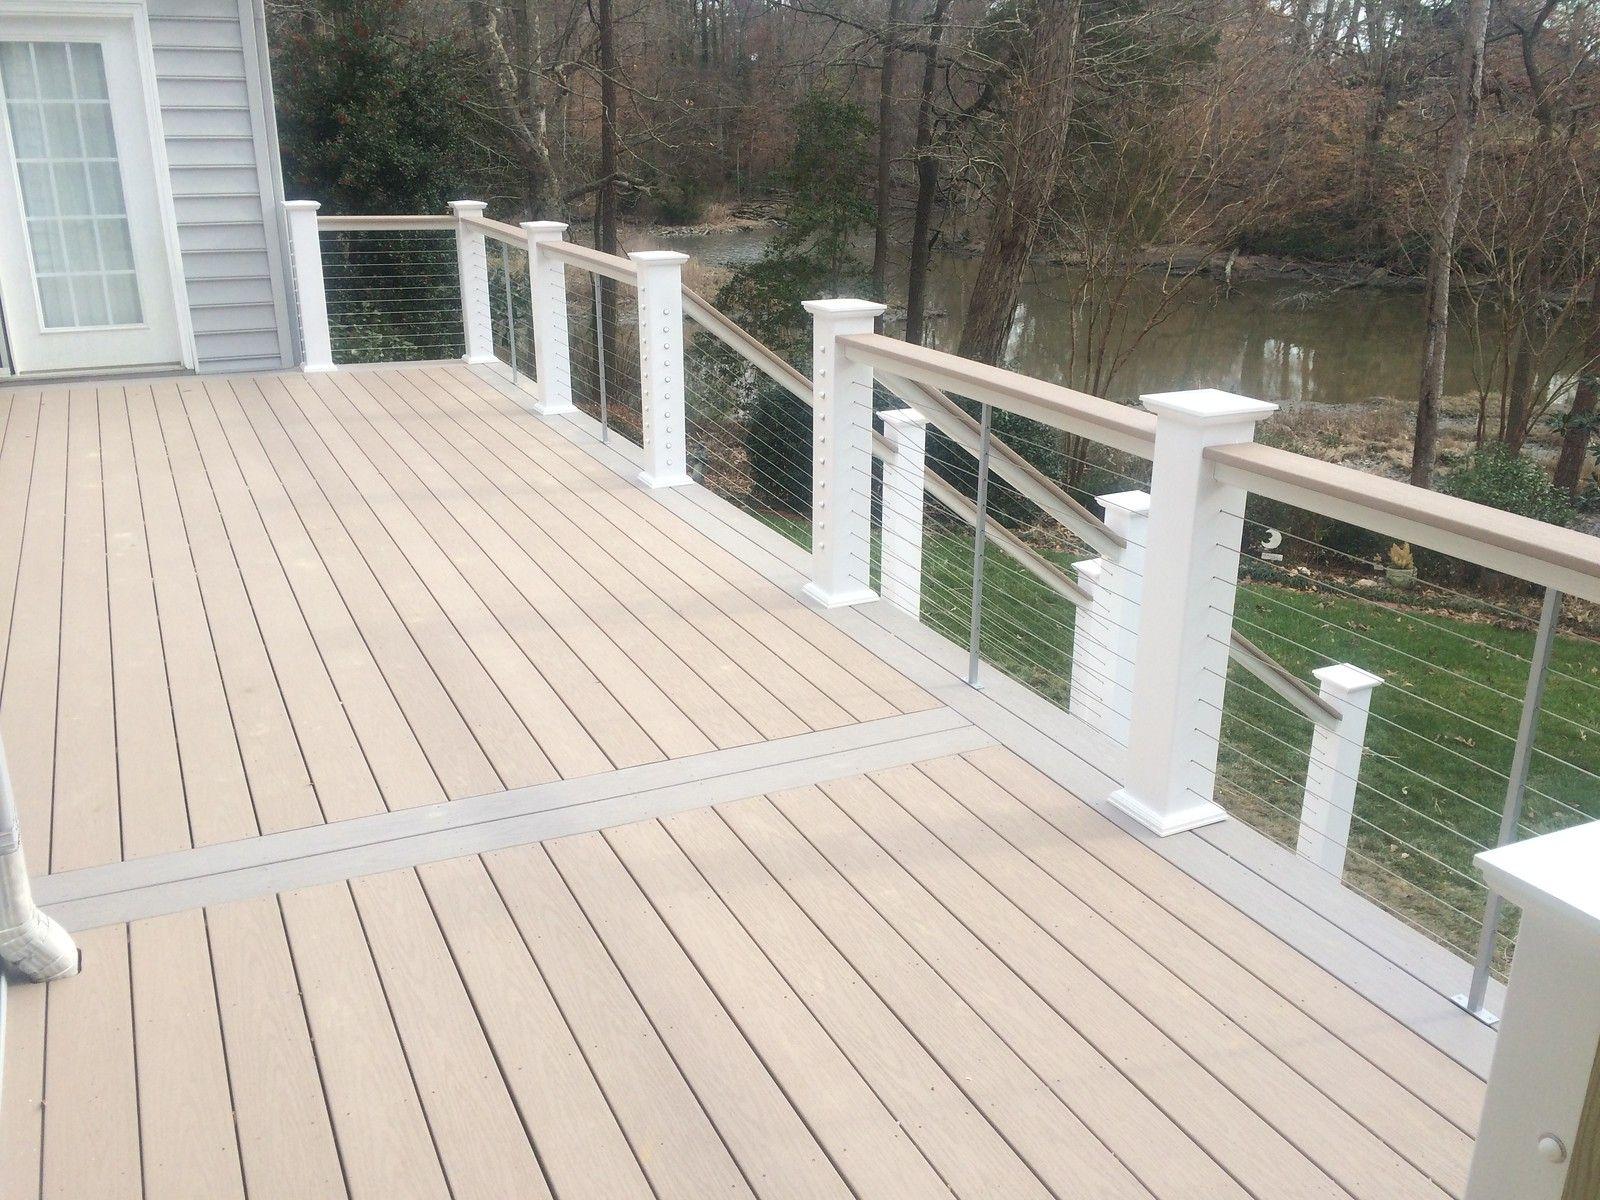 Outdoor Living Gallery Deck Railing Design Deck Deck Pictures